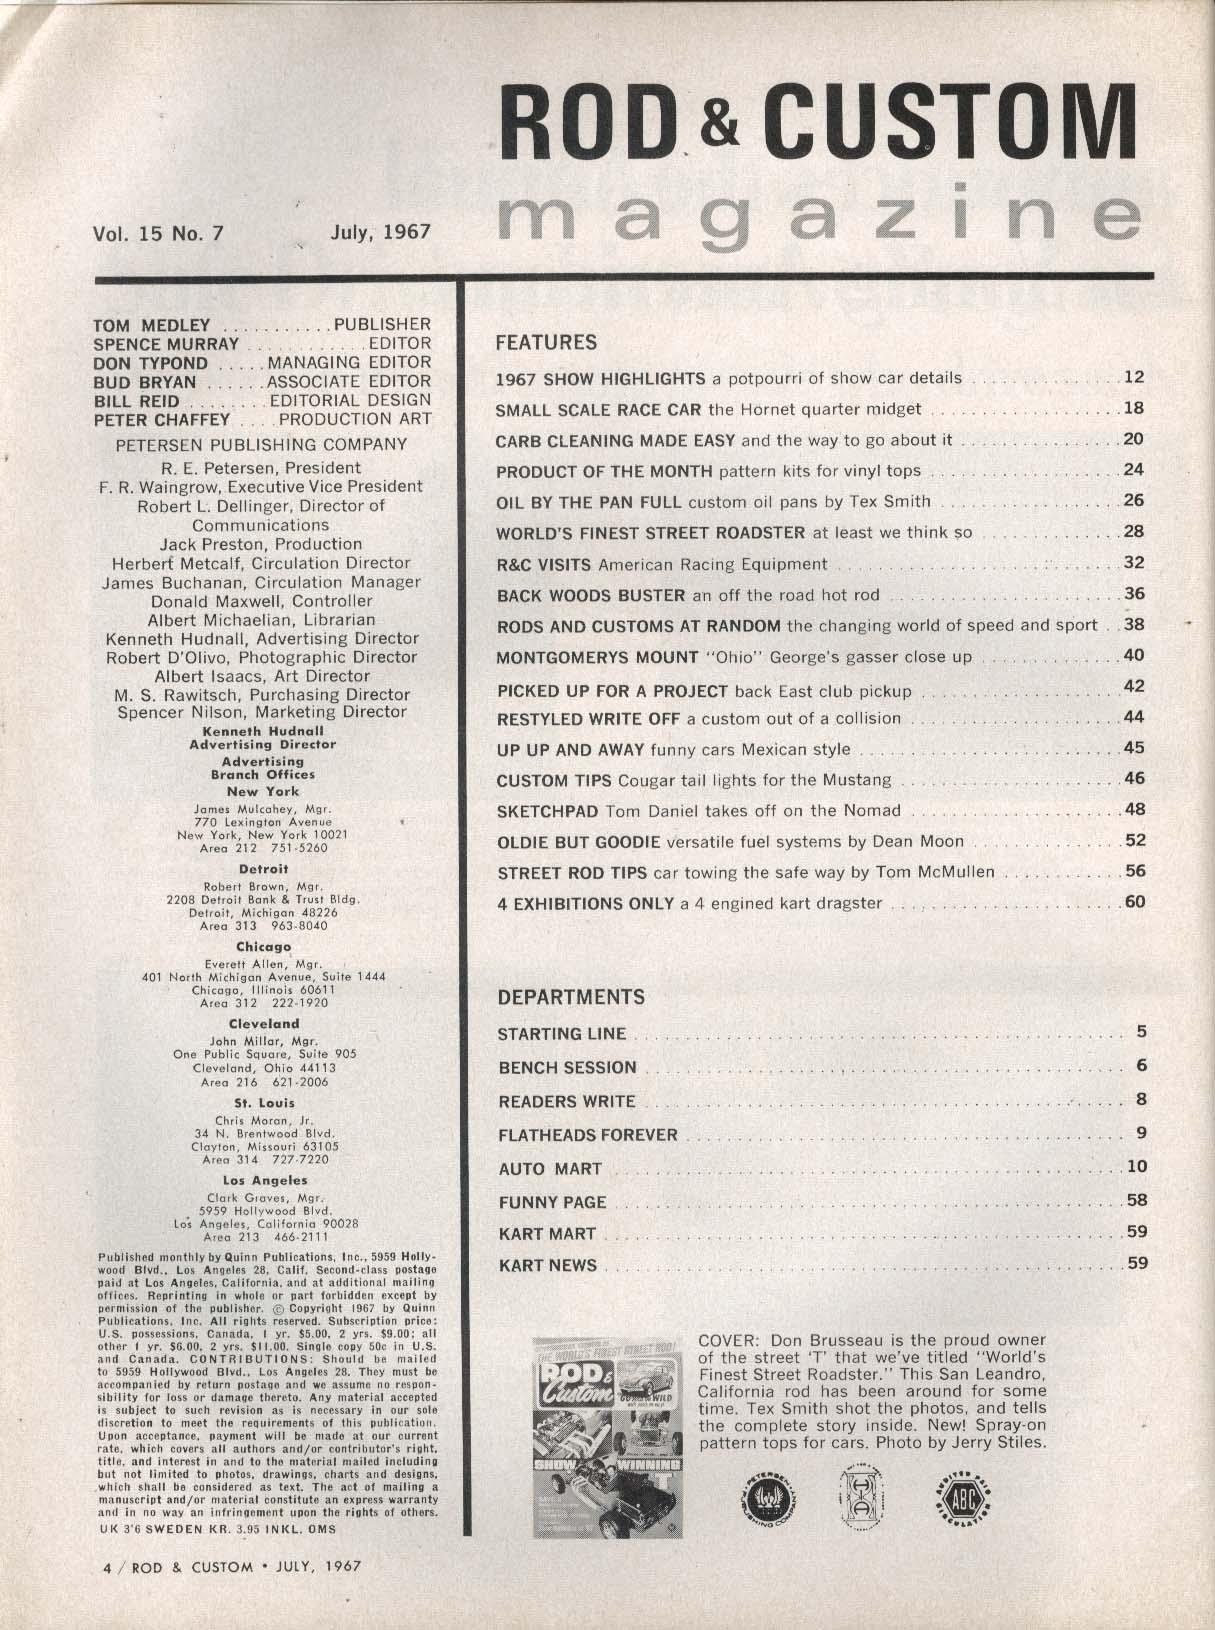 ROD & CUSTOM Hornet Quarter Midget Tex Smith Custom Oil Pans Ohio George 7 1967